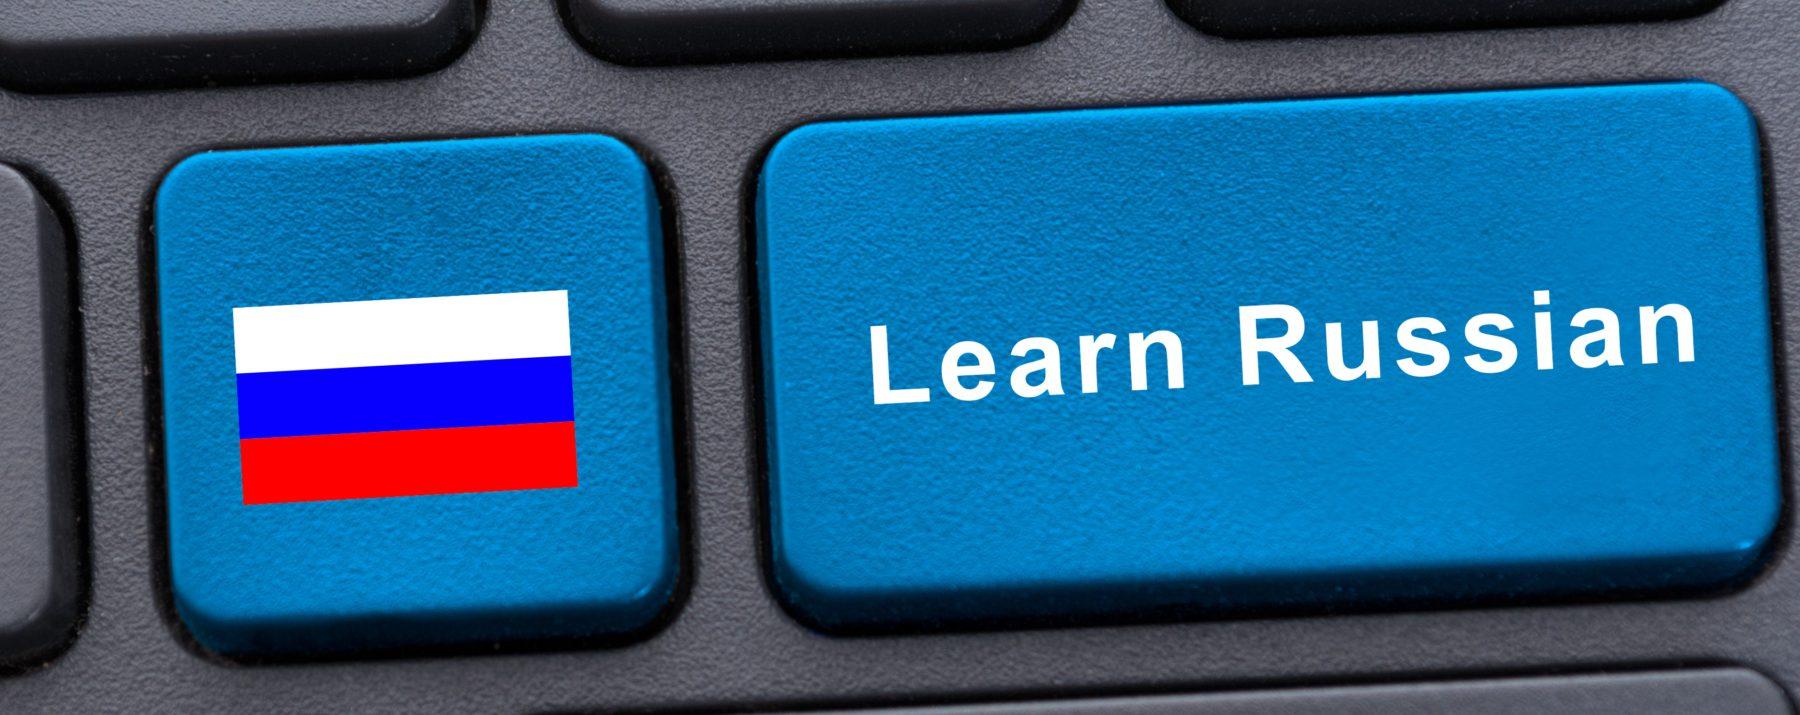 Russian language program